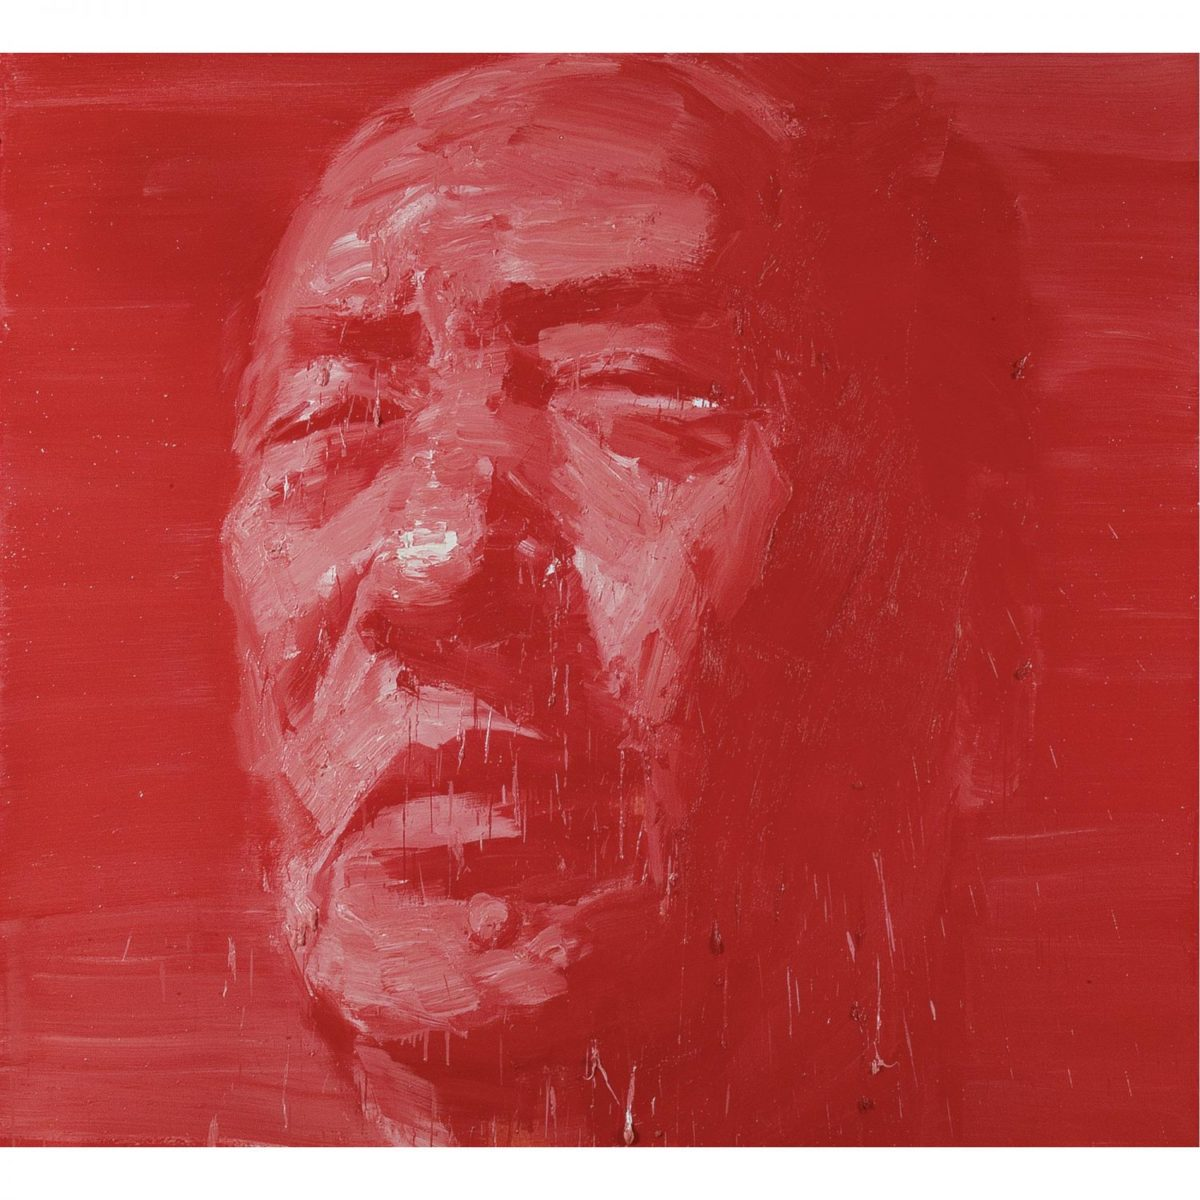 yan-pei-ming, mao, artiste-peintre, art-contemporain, galerie-thaddaeus-ropac, exposition